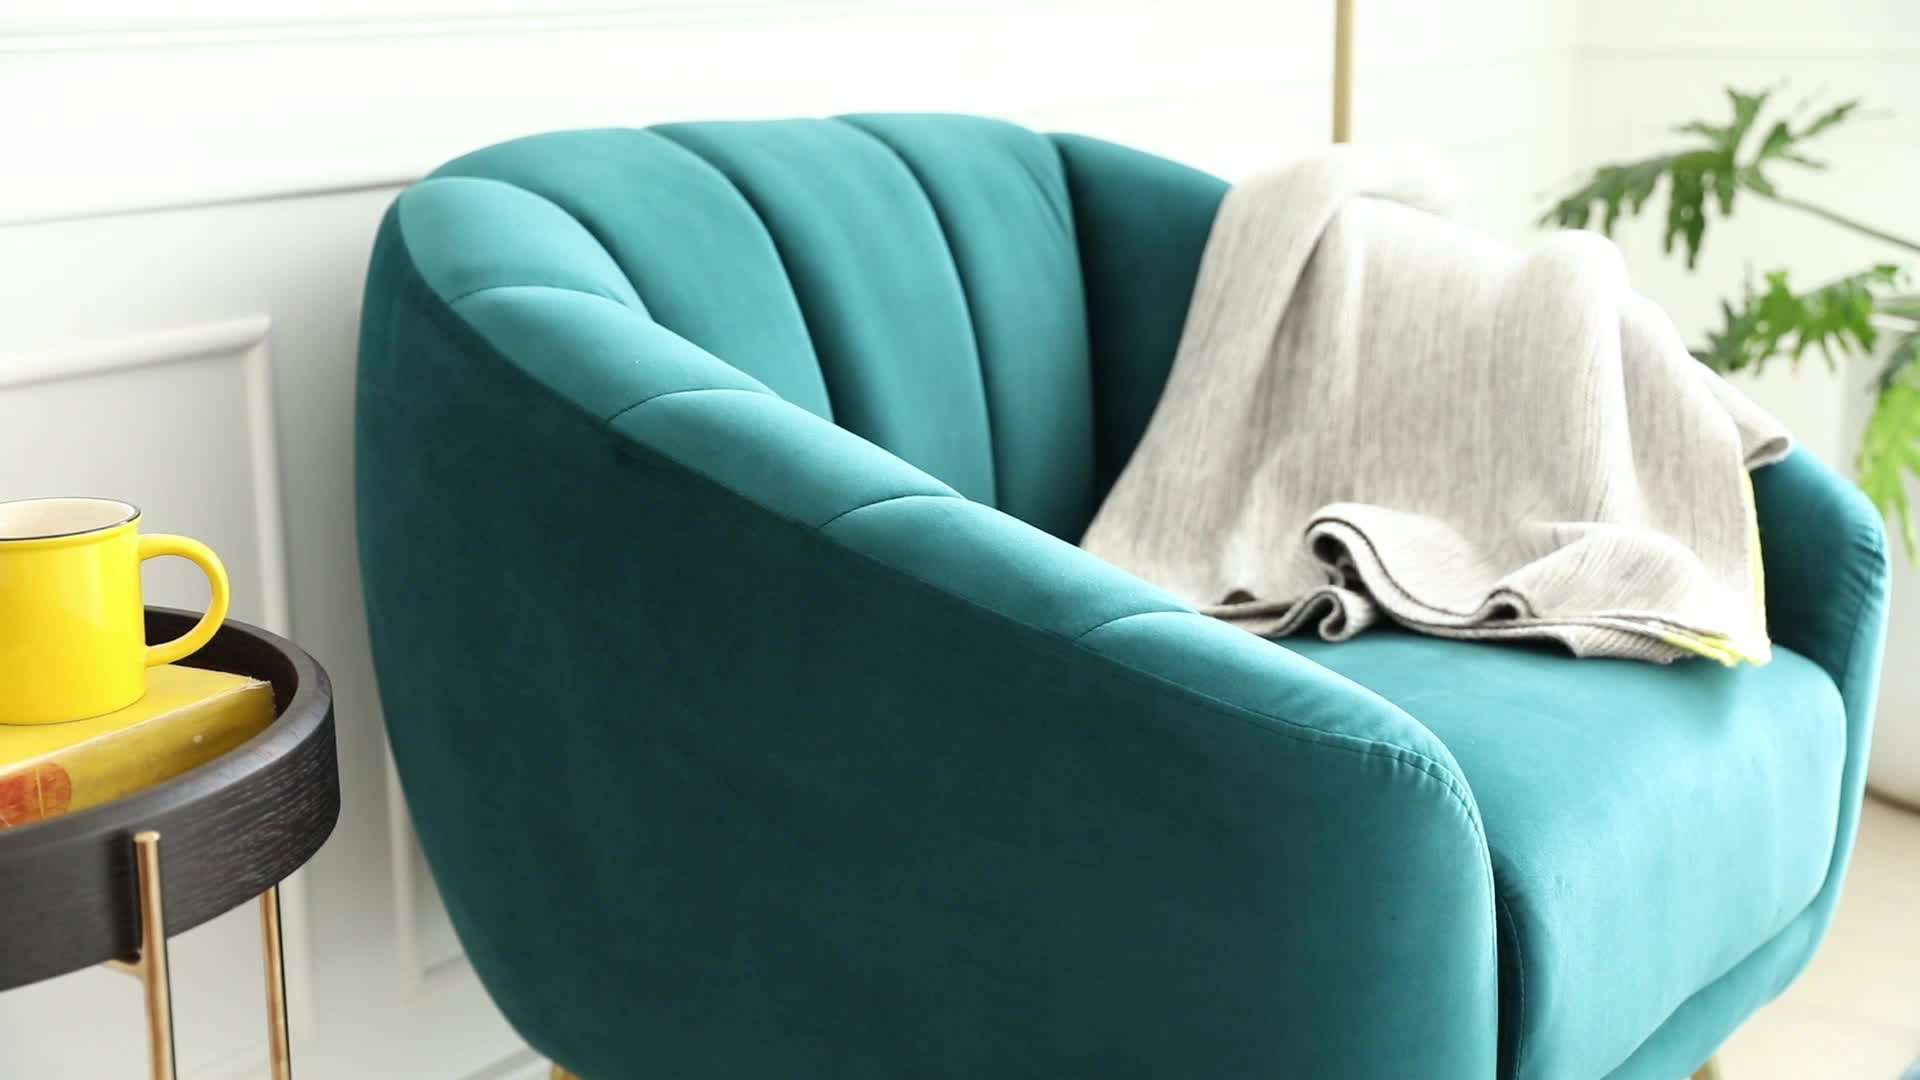 Hotel Moderne Houten Frame Lounge Sofa Single Seater Fluwelen Fauteuil